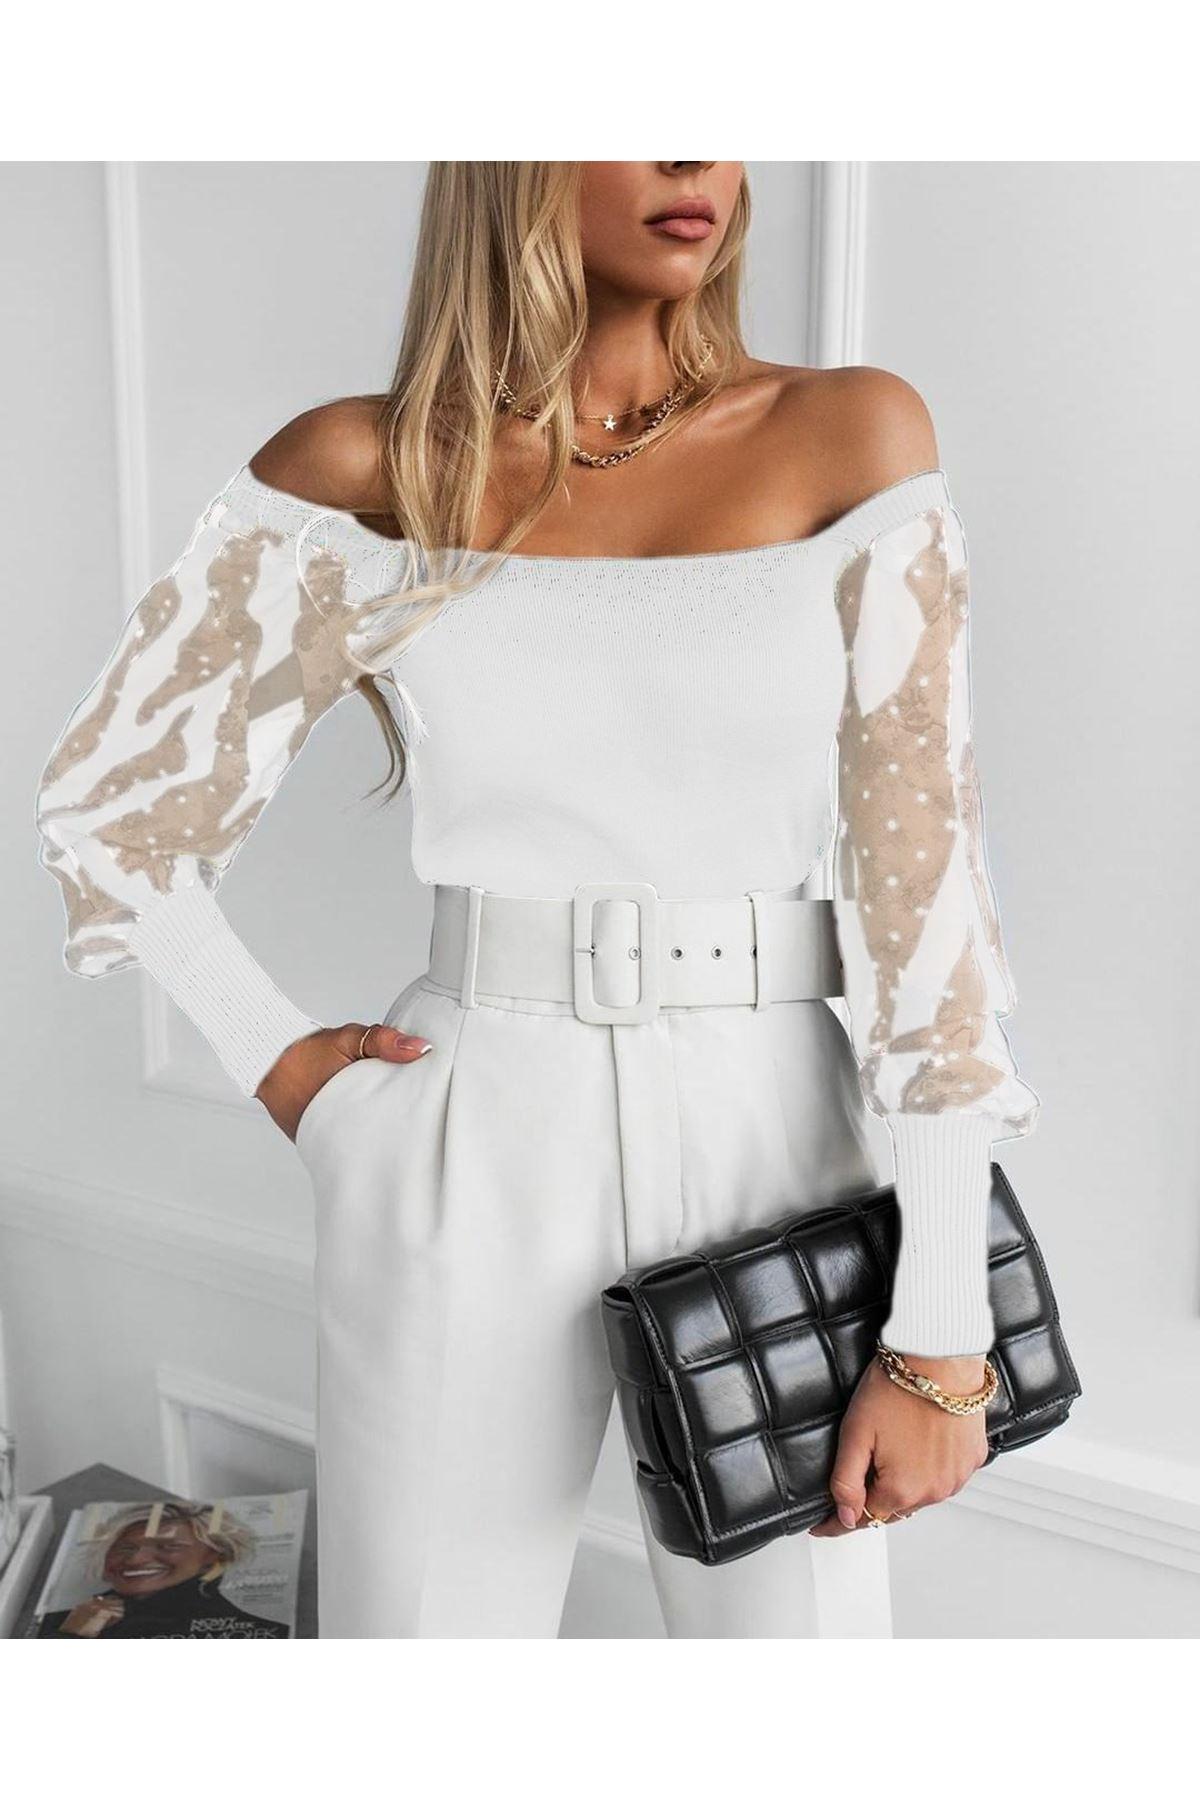 Kol Tül ve Puan Detaylı Bluz - beyaz